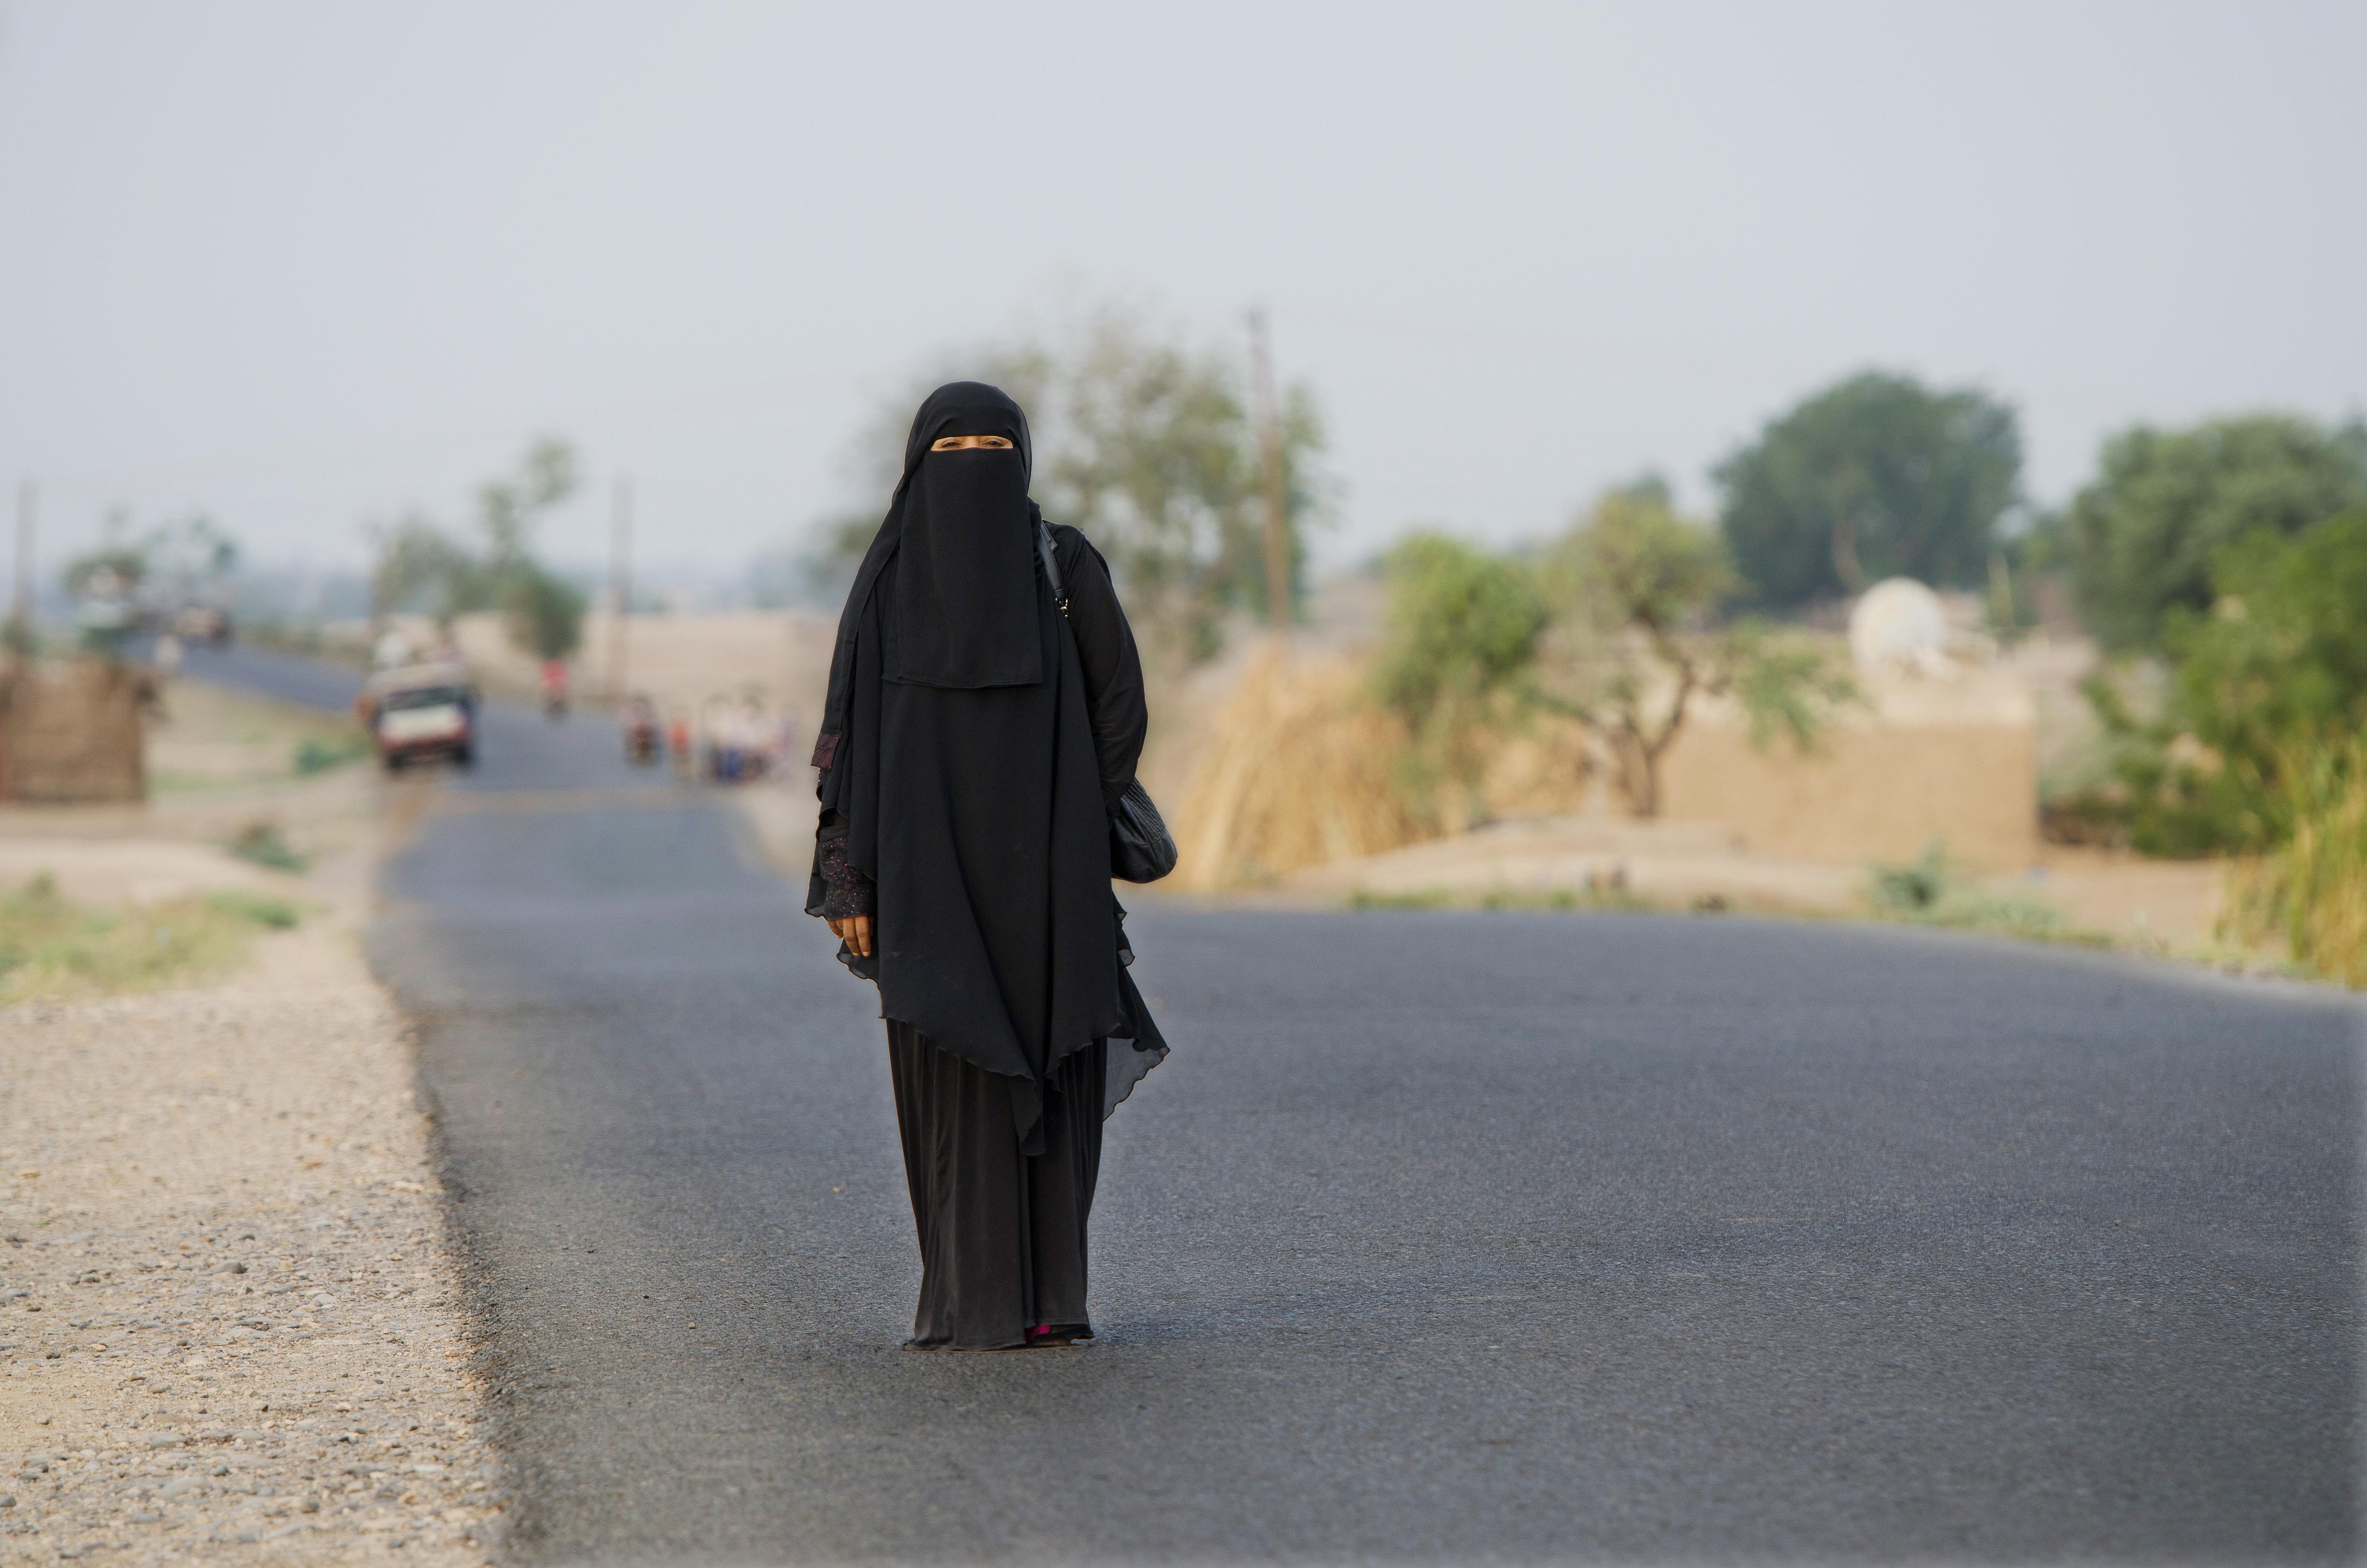 Safia, one of the women who we worked alongside as part of Progressio's WASH project in Yemen, 2014. © Amira Al-Sharif/Progressio